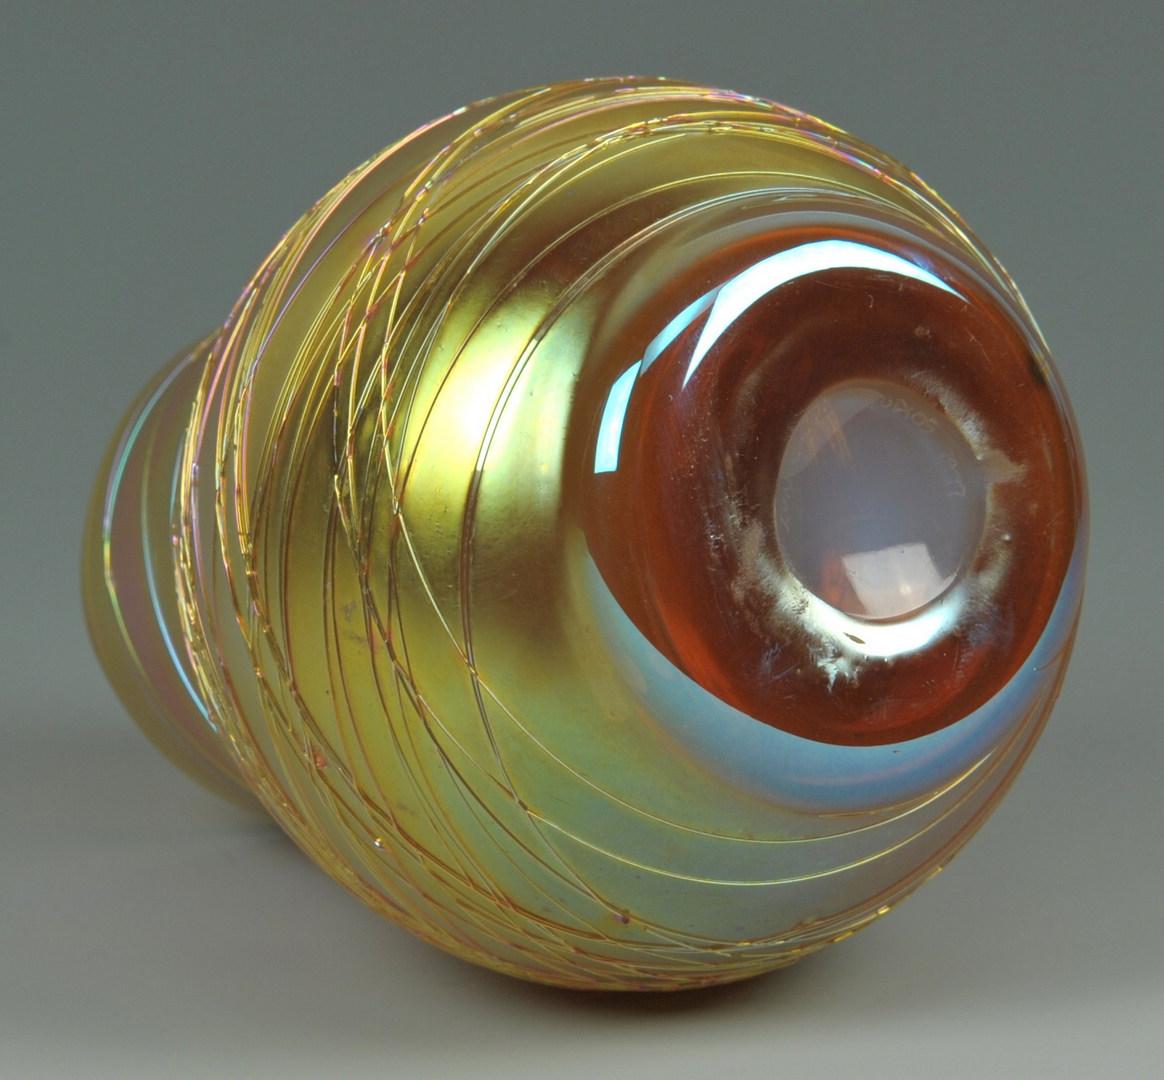 Lot 272: Four pcs contemporary art glass, incl. R. Jolley